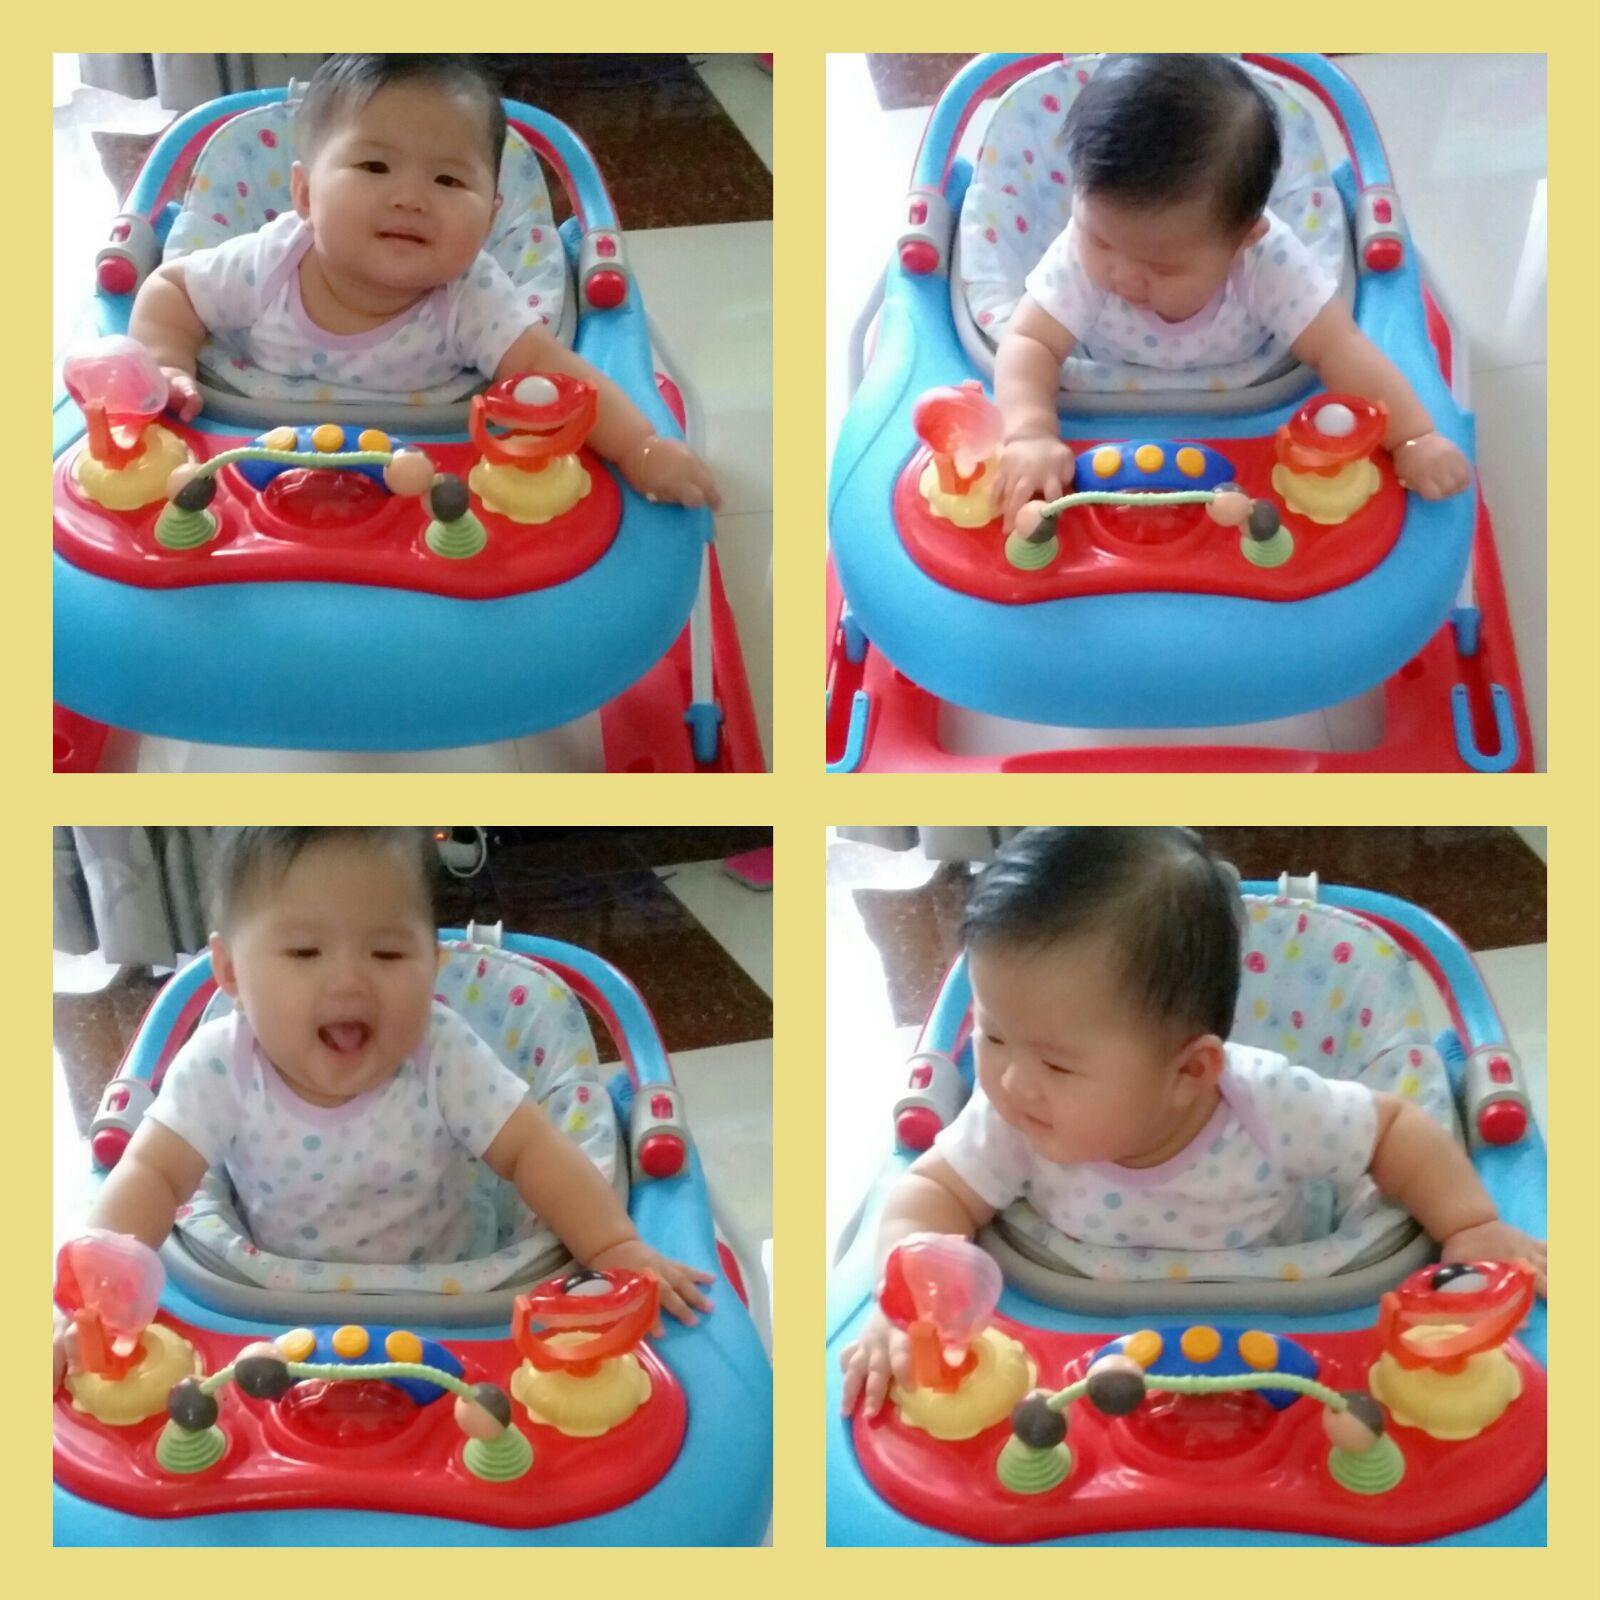 Care Baby Walker | Beeboo Toy Rental - Sewa menyewa jadi lebih mudah di Spotsewa